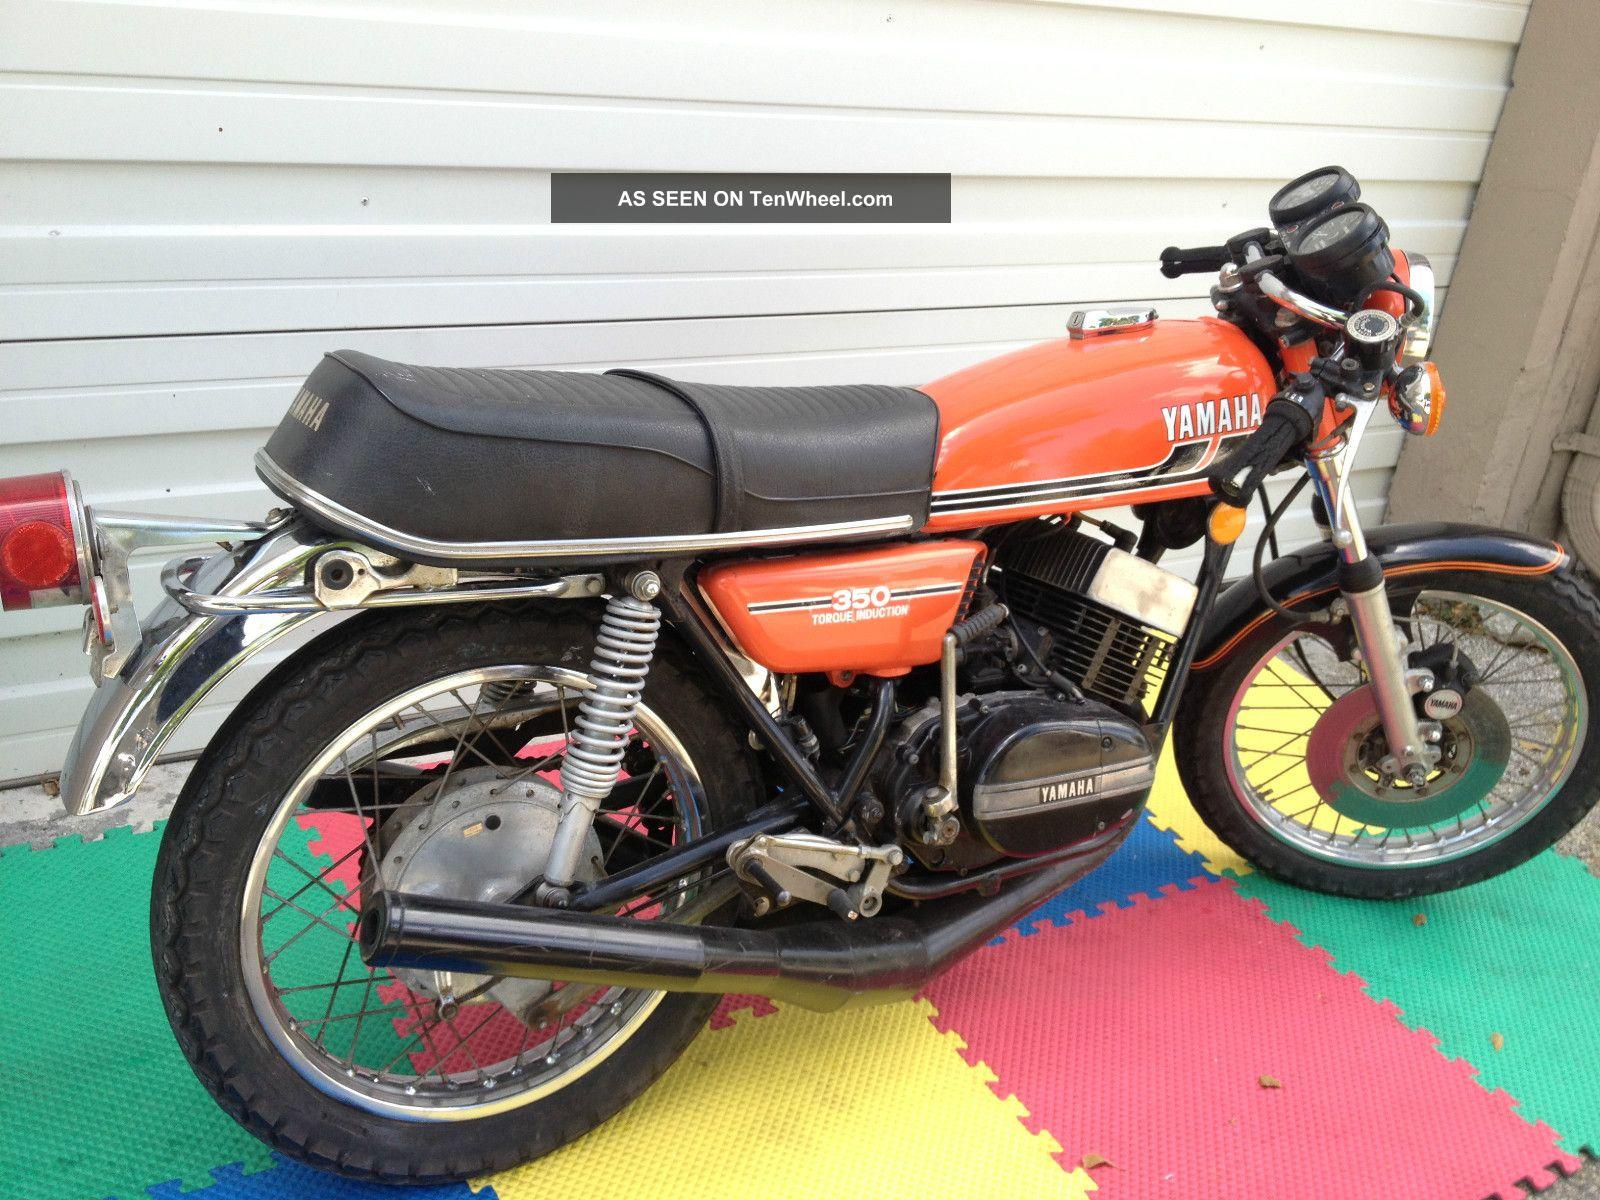 1975 Yamaha Rd - 350 - B